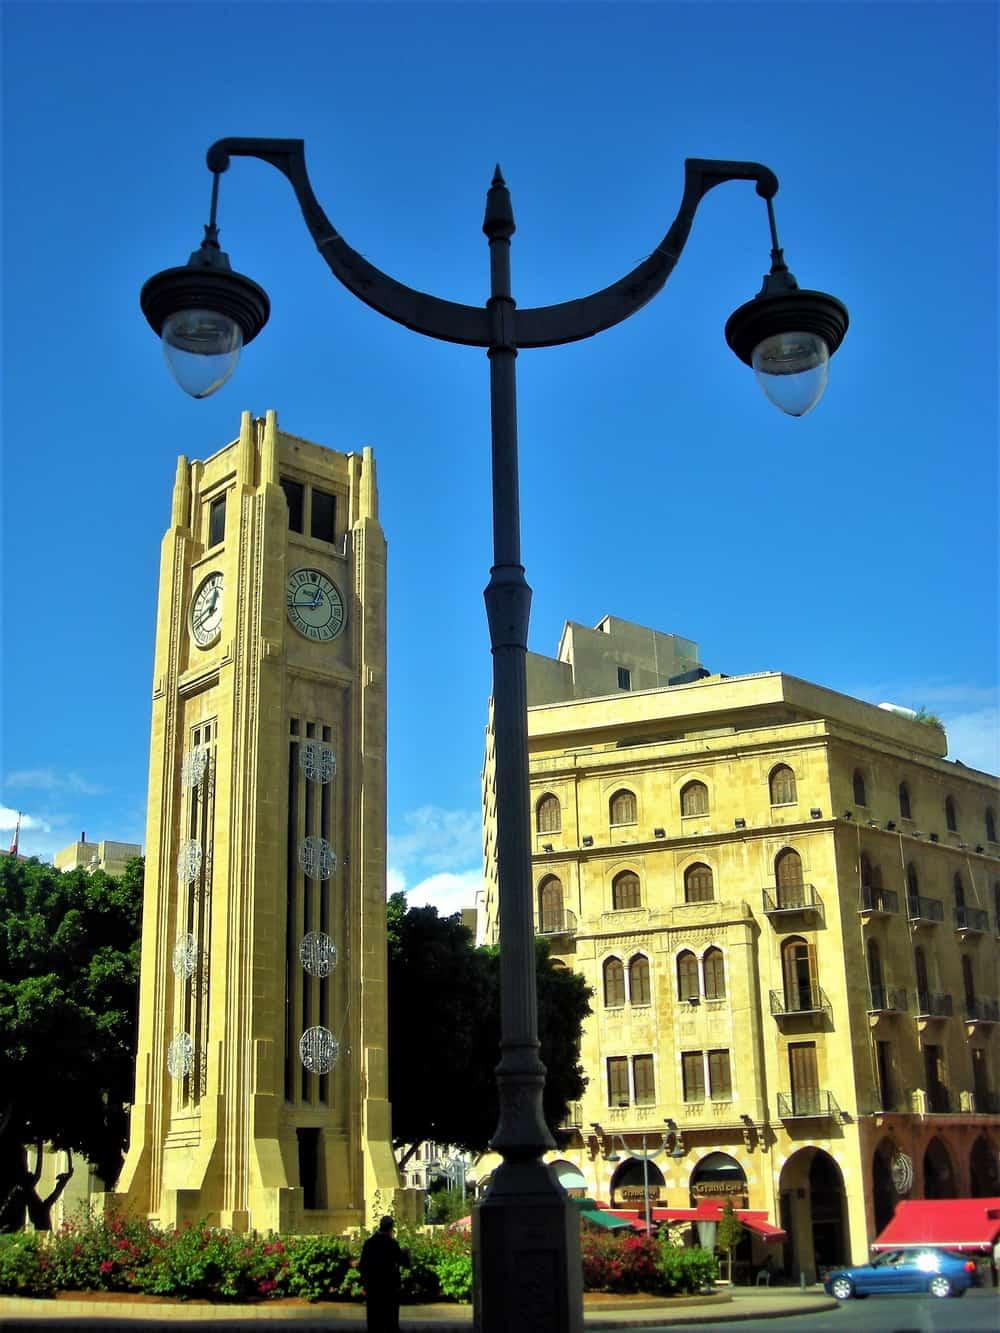 Place de l'Étoile: sat na sahat-kuli je – Rolexov! Dobra reklama, dobar pokazatelj kako se ovde živi. Kako neki ovde žive.